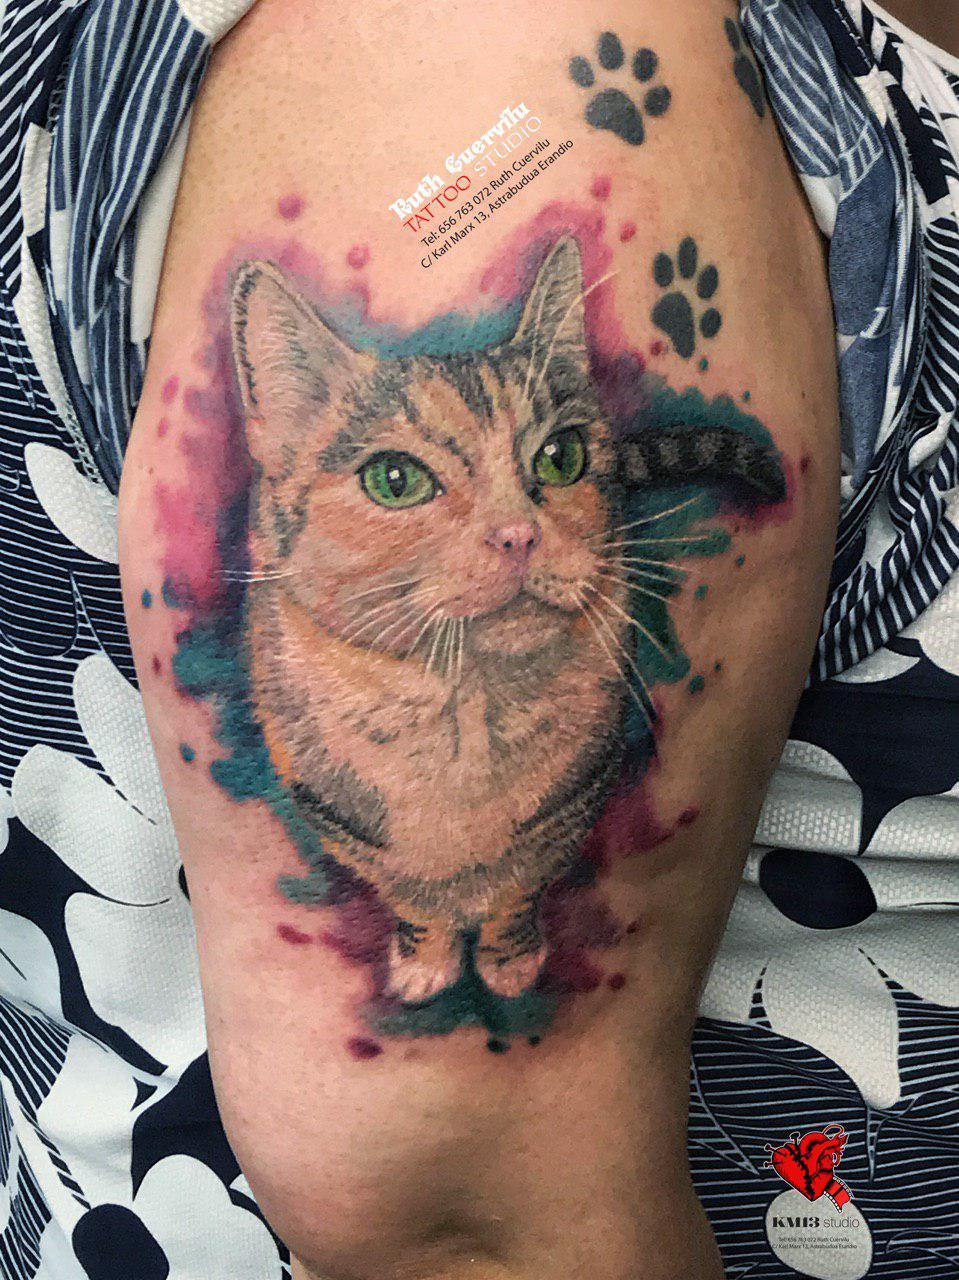 Tatuaje Gato - diseño propio - Ruth Cuervilu Tattoo - KM13 Studio